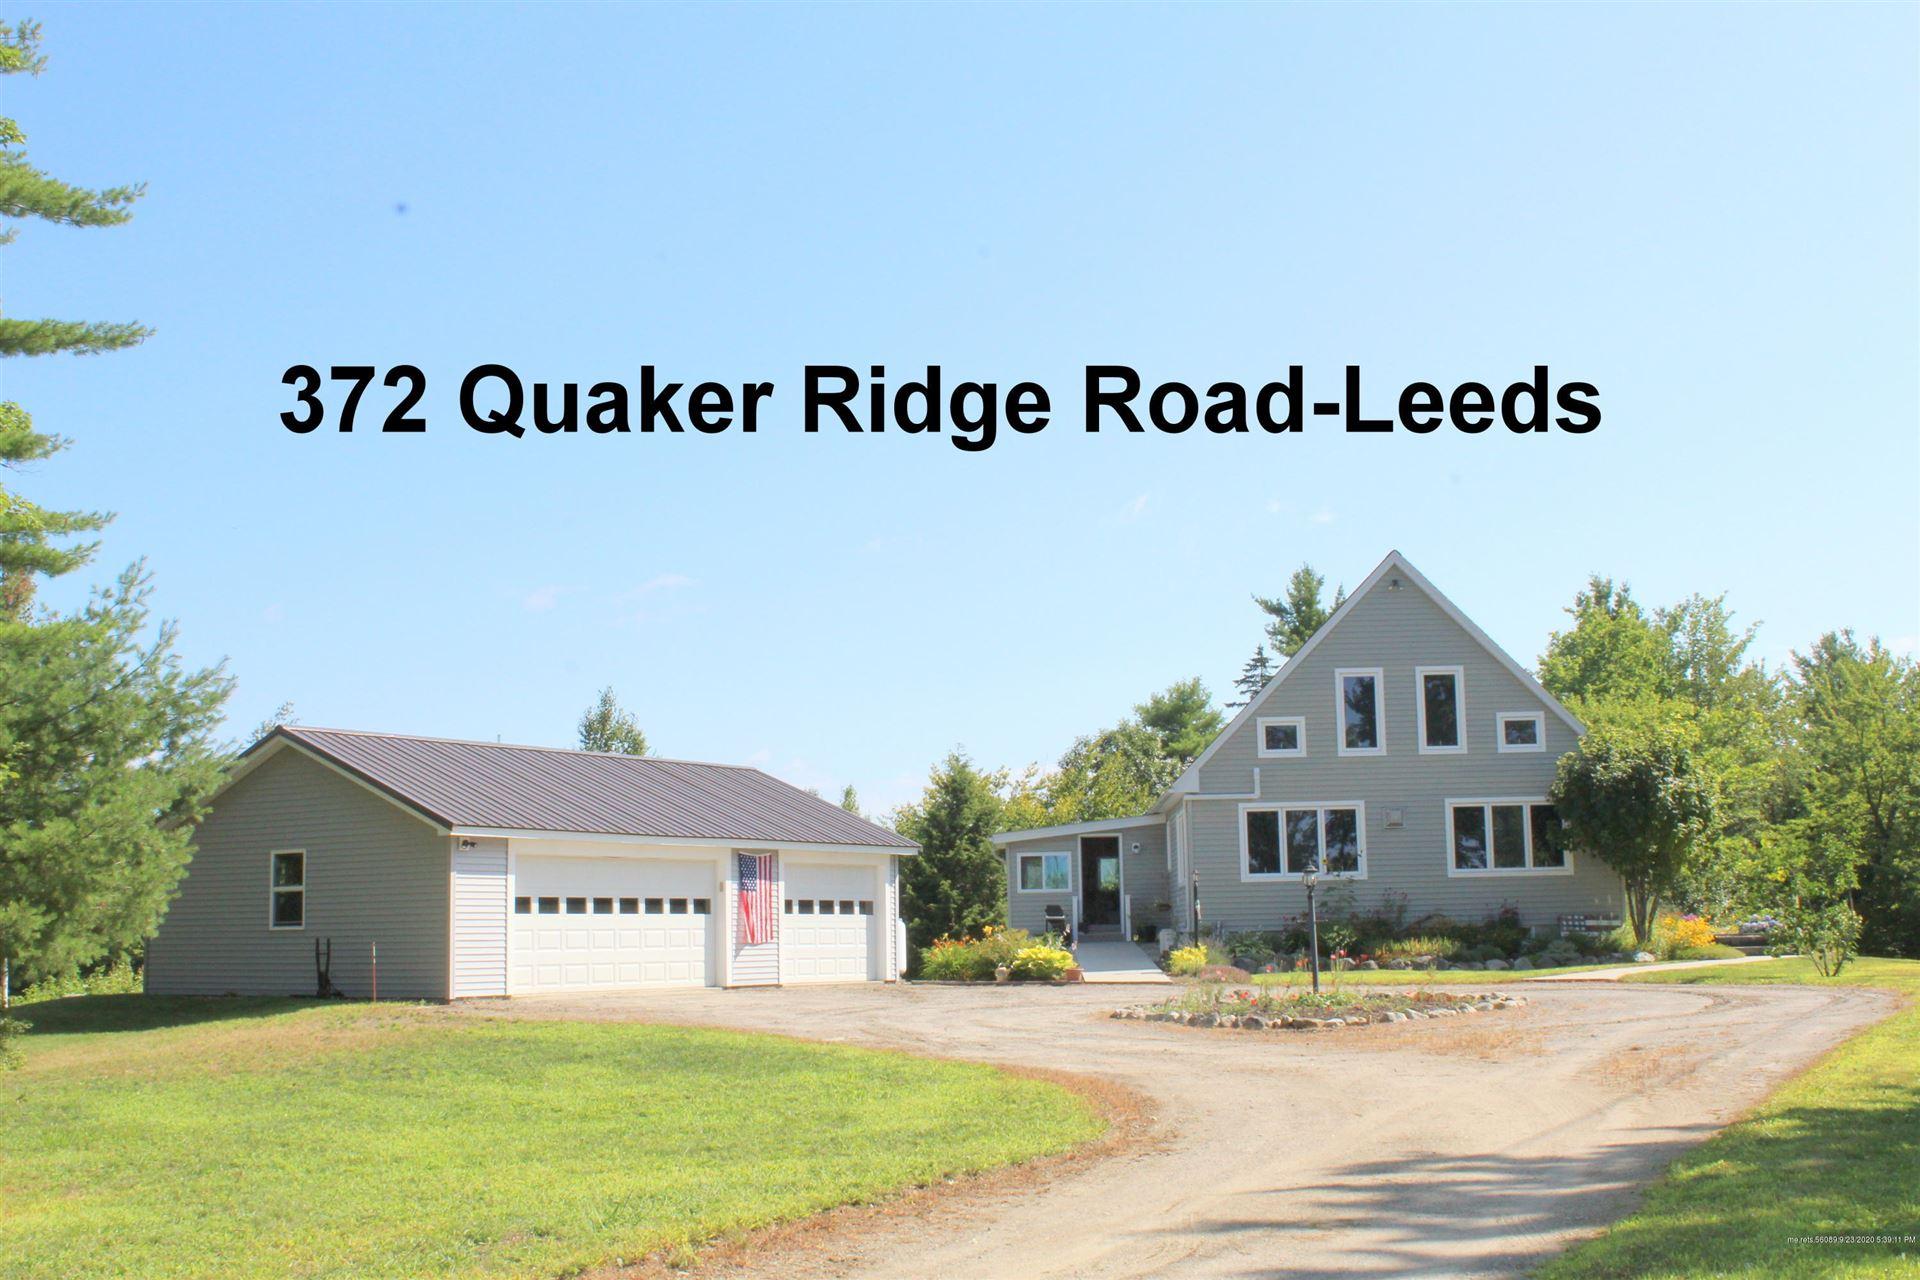 Photo of 372 Quaker Ridge Road, Leeds, ME 04263 (MLS # 1470004)